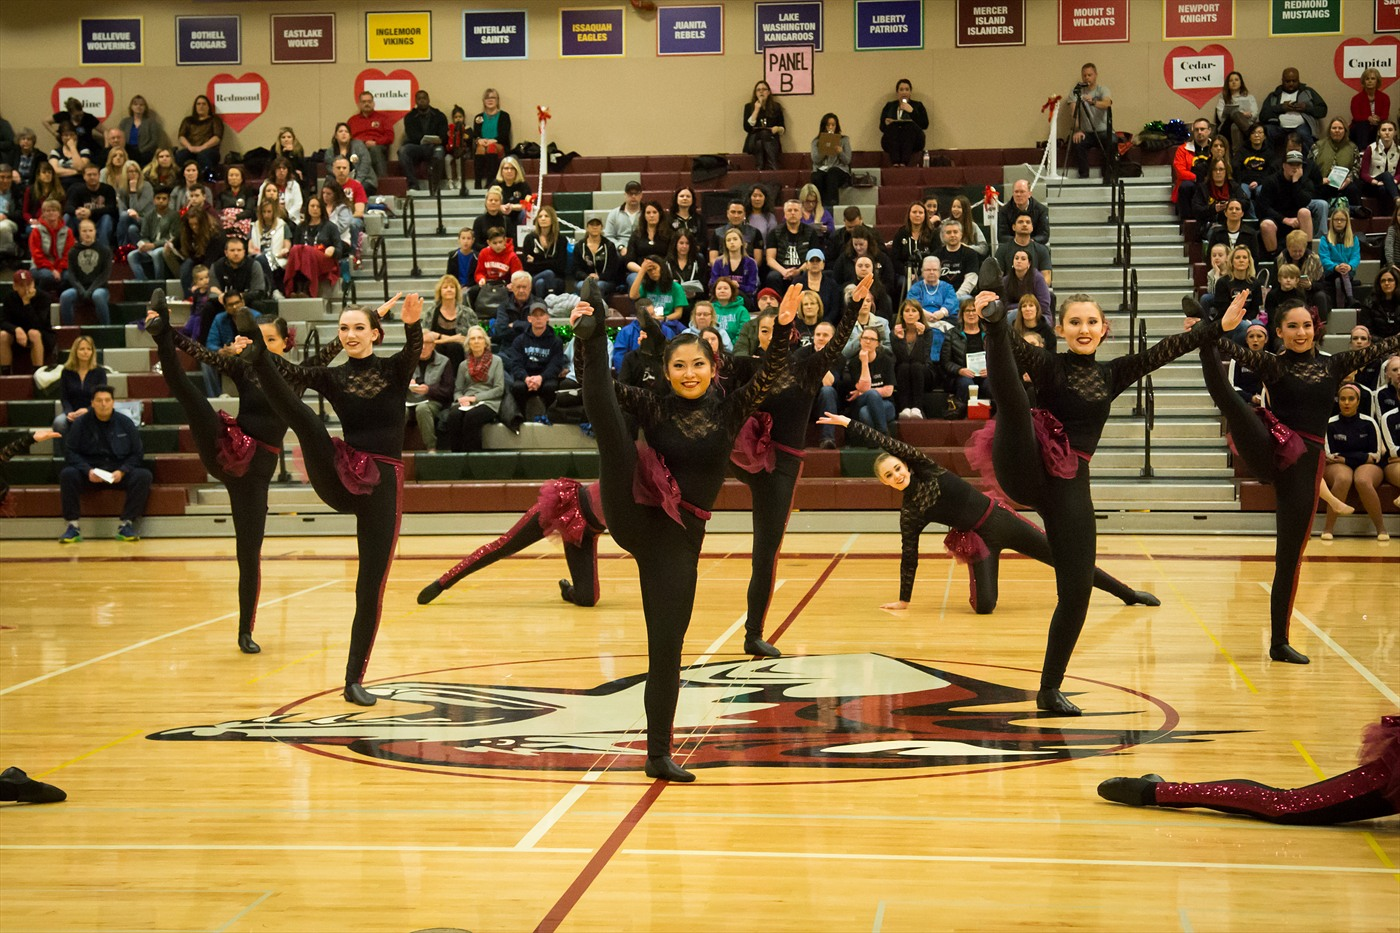 SDT Eastlake Competition (6 of 100) – Skyline Dance Team